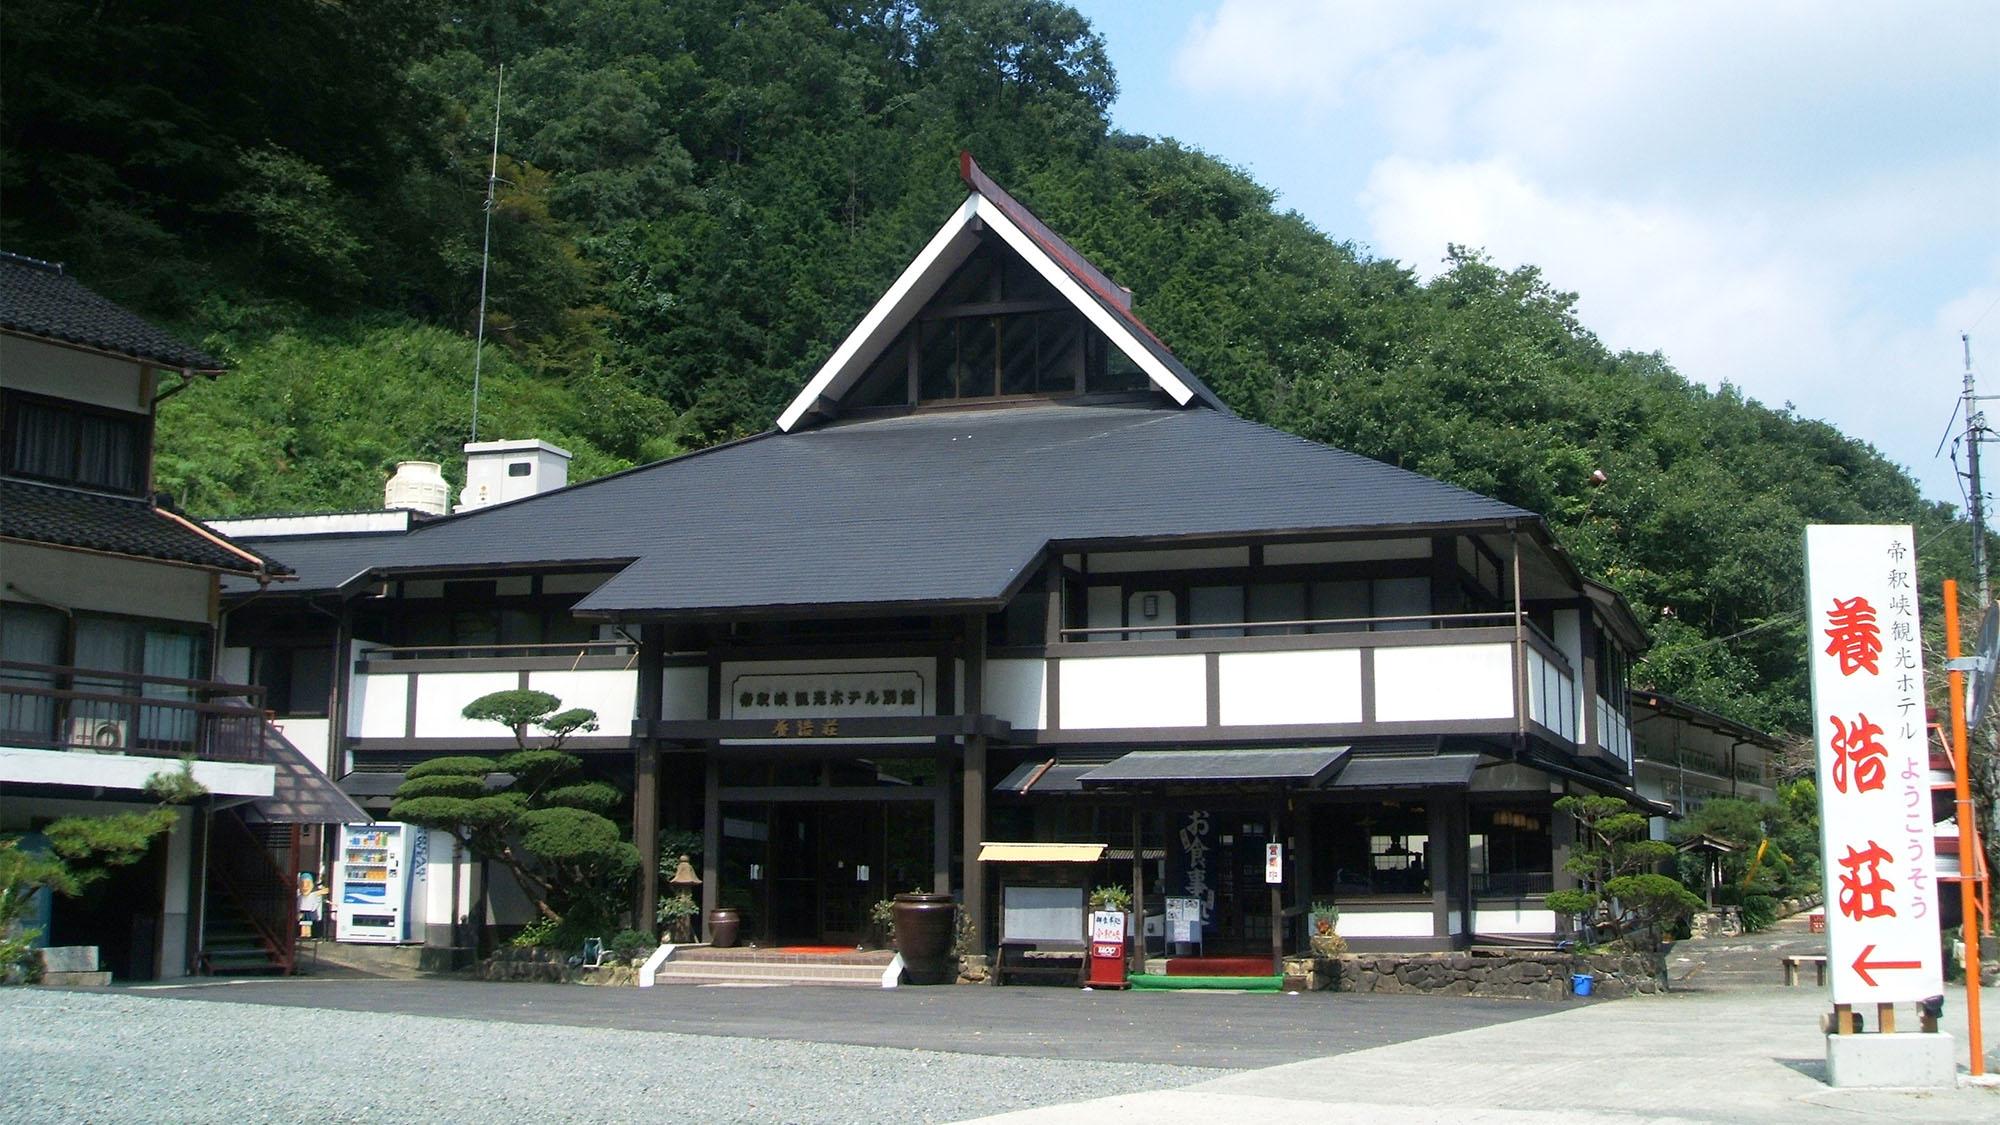 帝釈峡観光ホテル別館養浩荘の施設画像